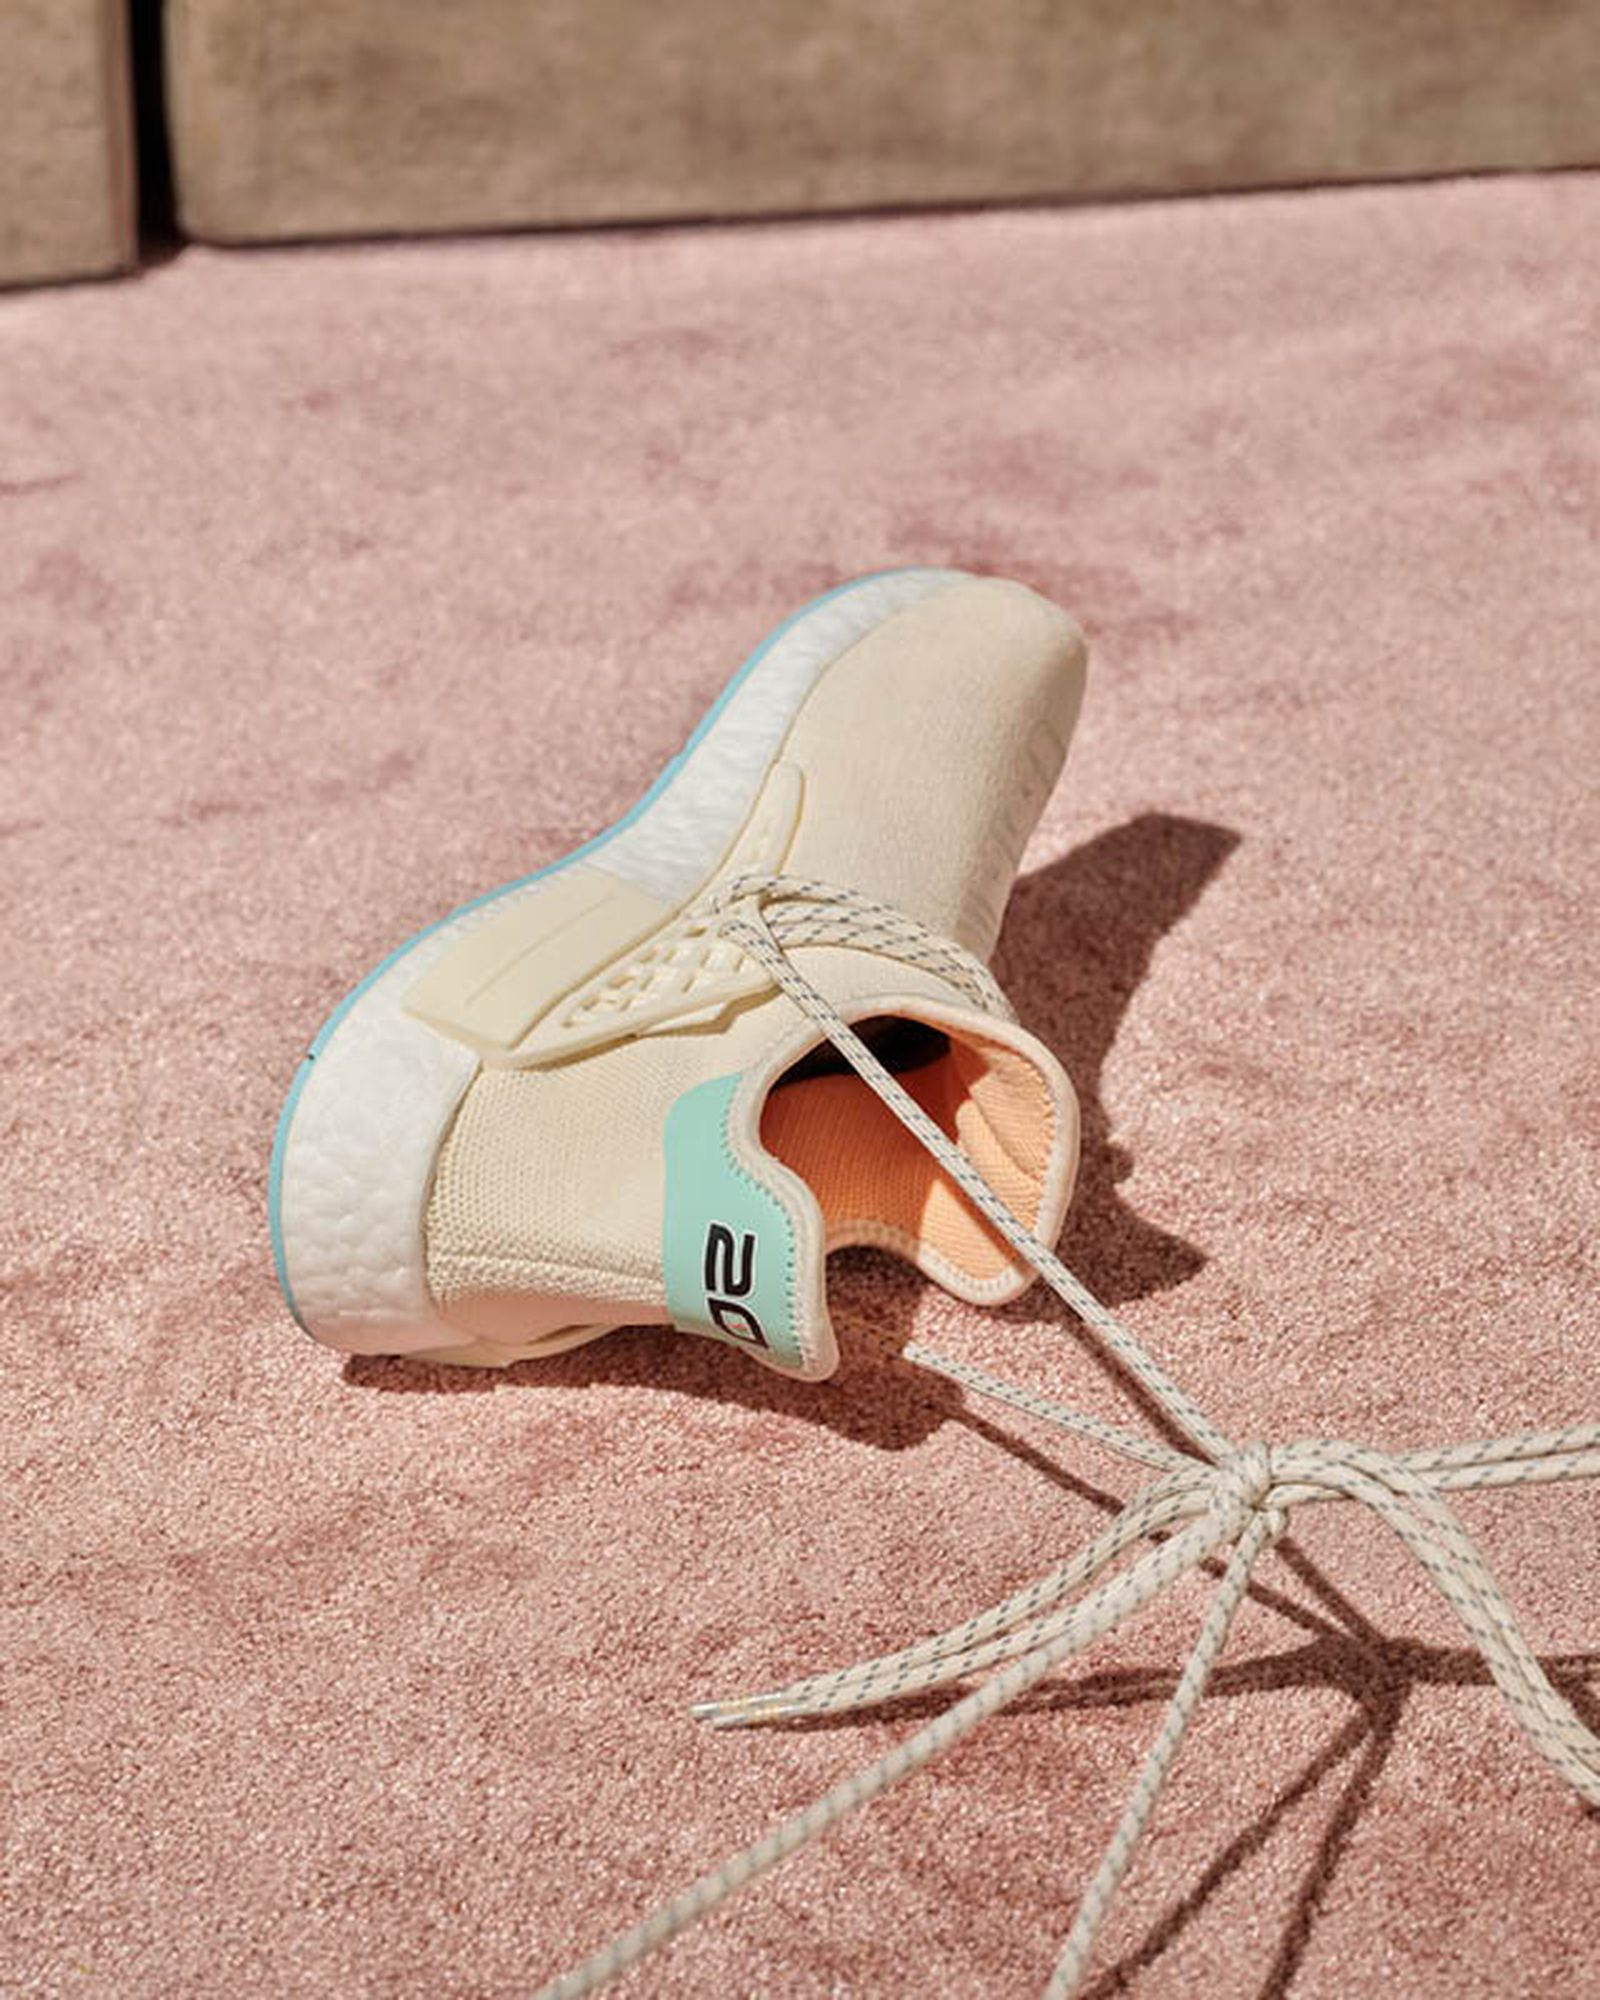 nerd-adidas-nmd-hu-release-date-price-03